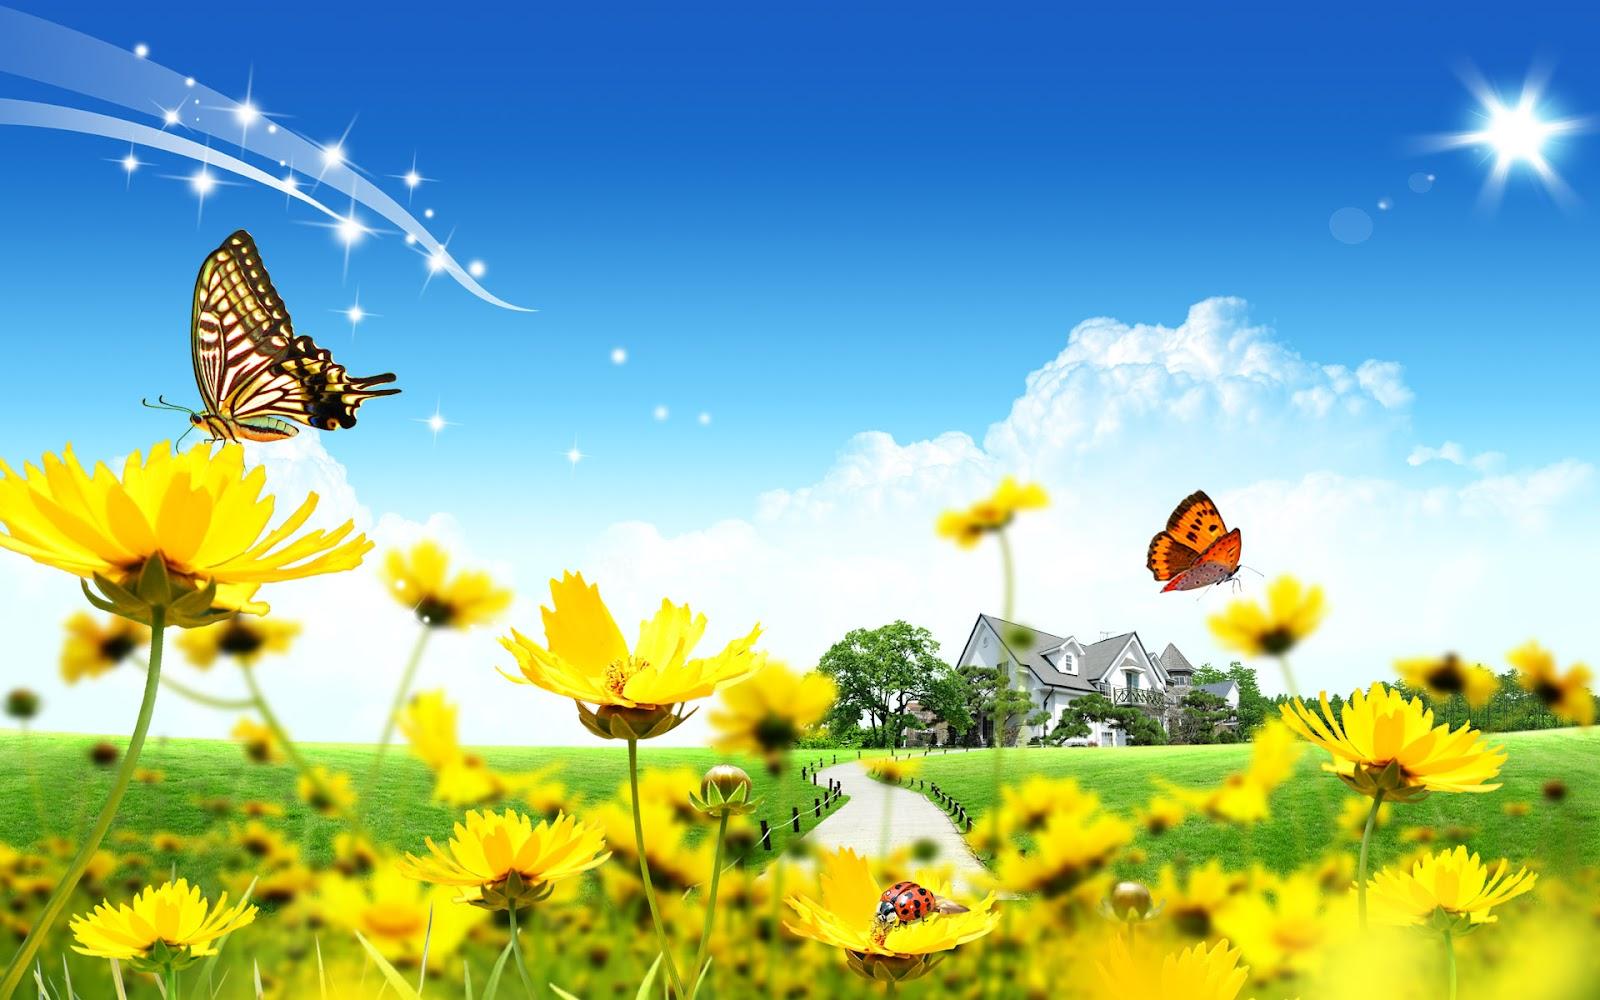 Beautiful Summer Season in the World